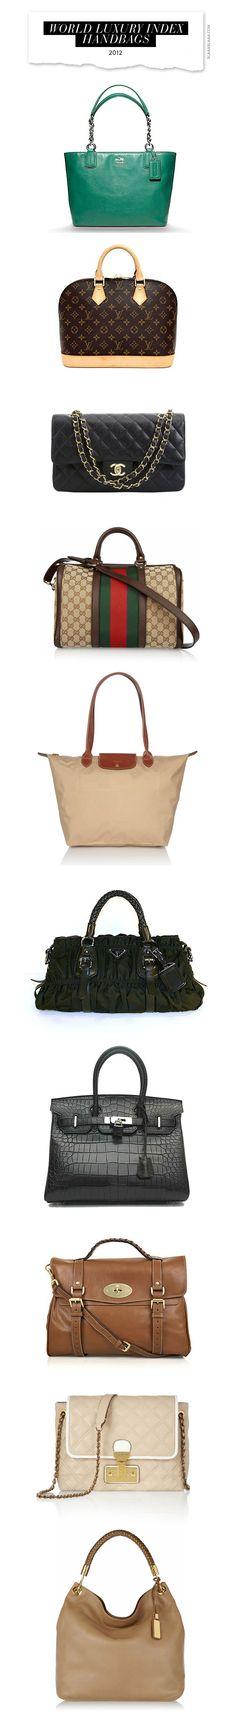 World Luxury Index Handbags 2012